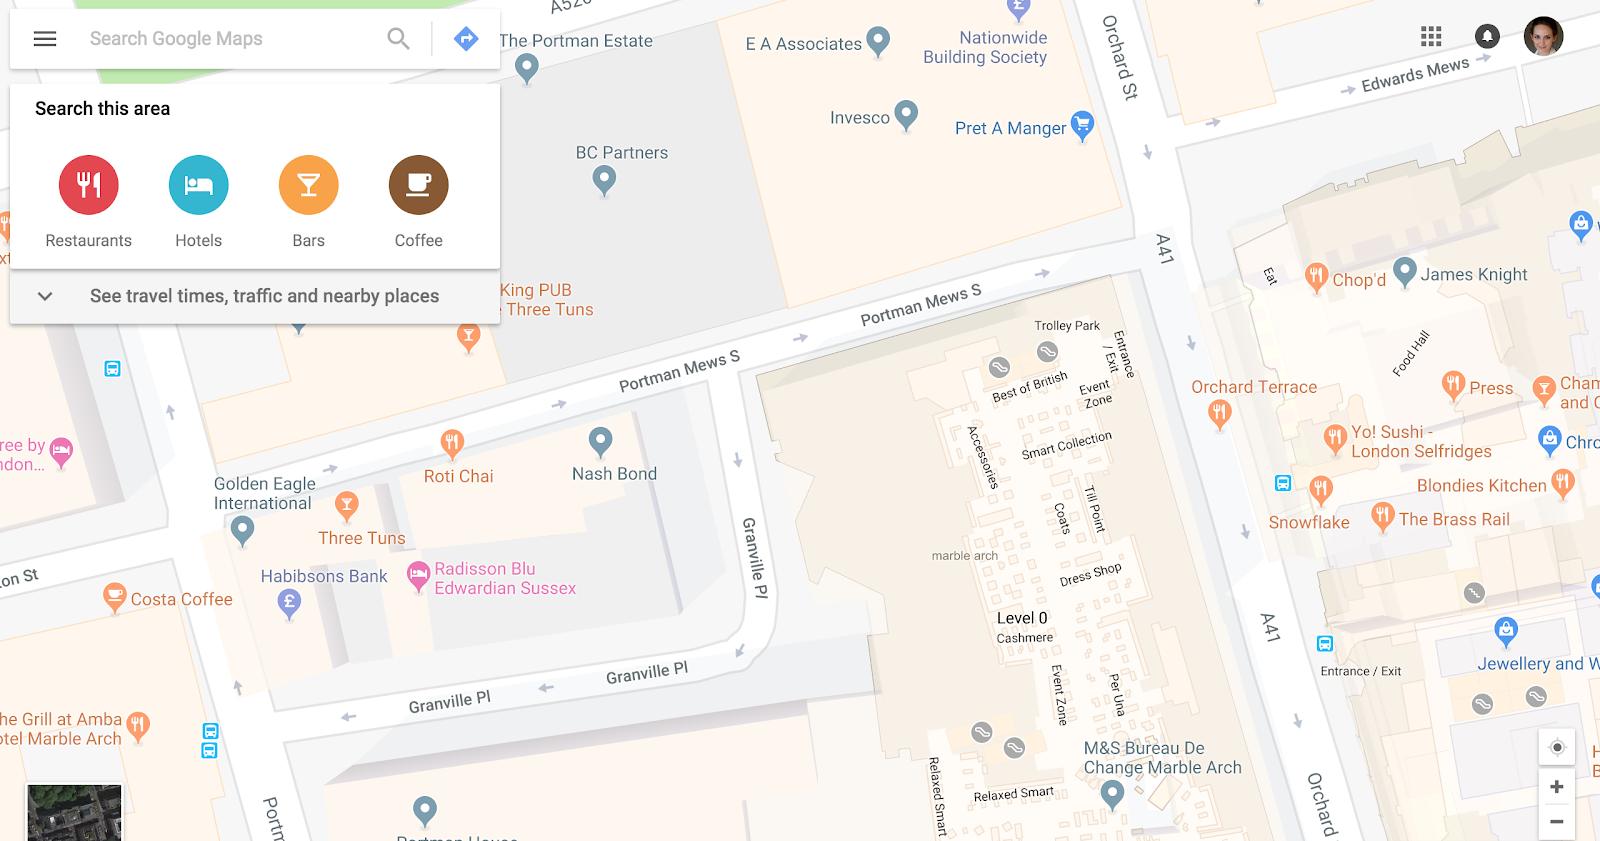 Selfridges-map-on-a-website